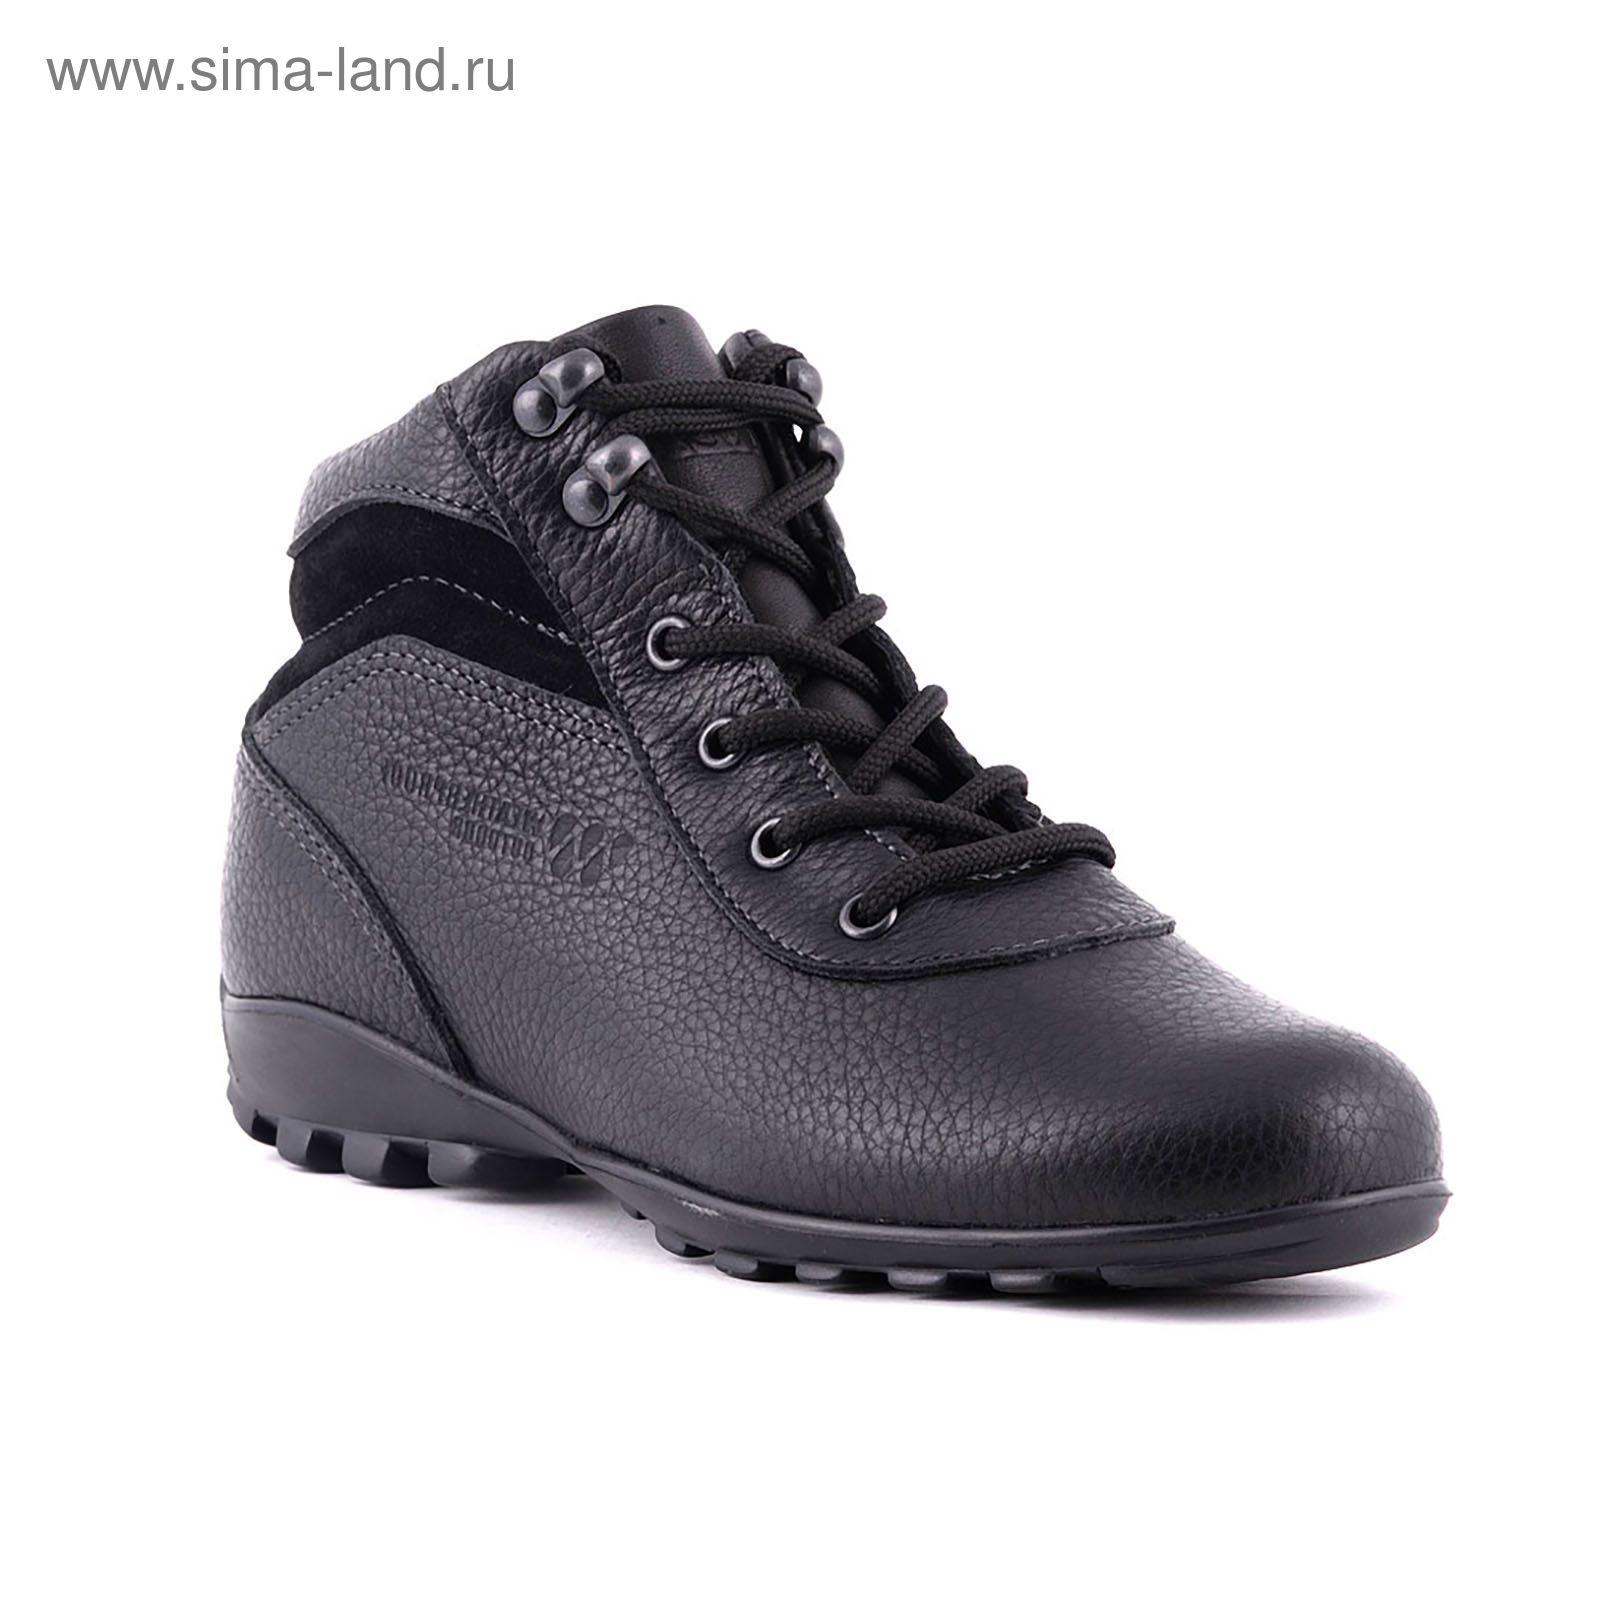 Ботинки TREK Спринт 93-01 капровелюр (черный) (р.41) (1675140 ... a0b3f3d5e1f